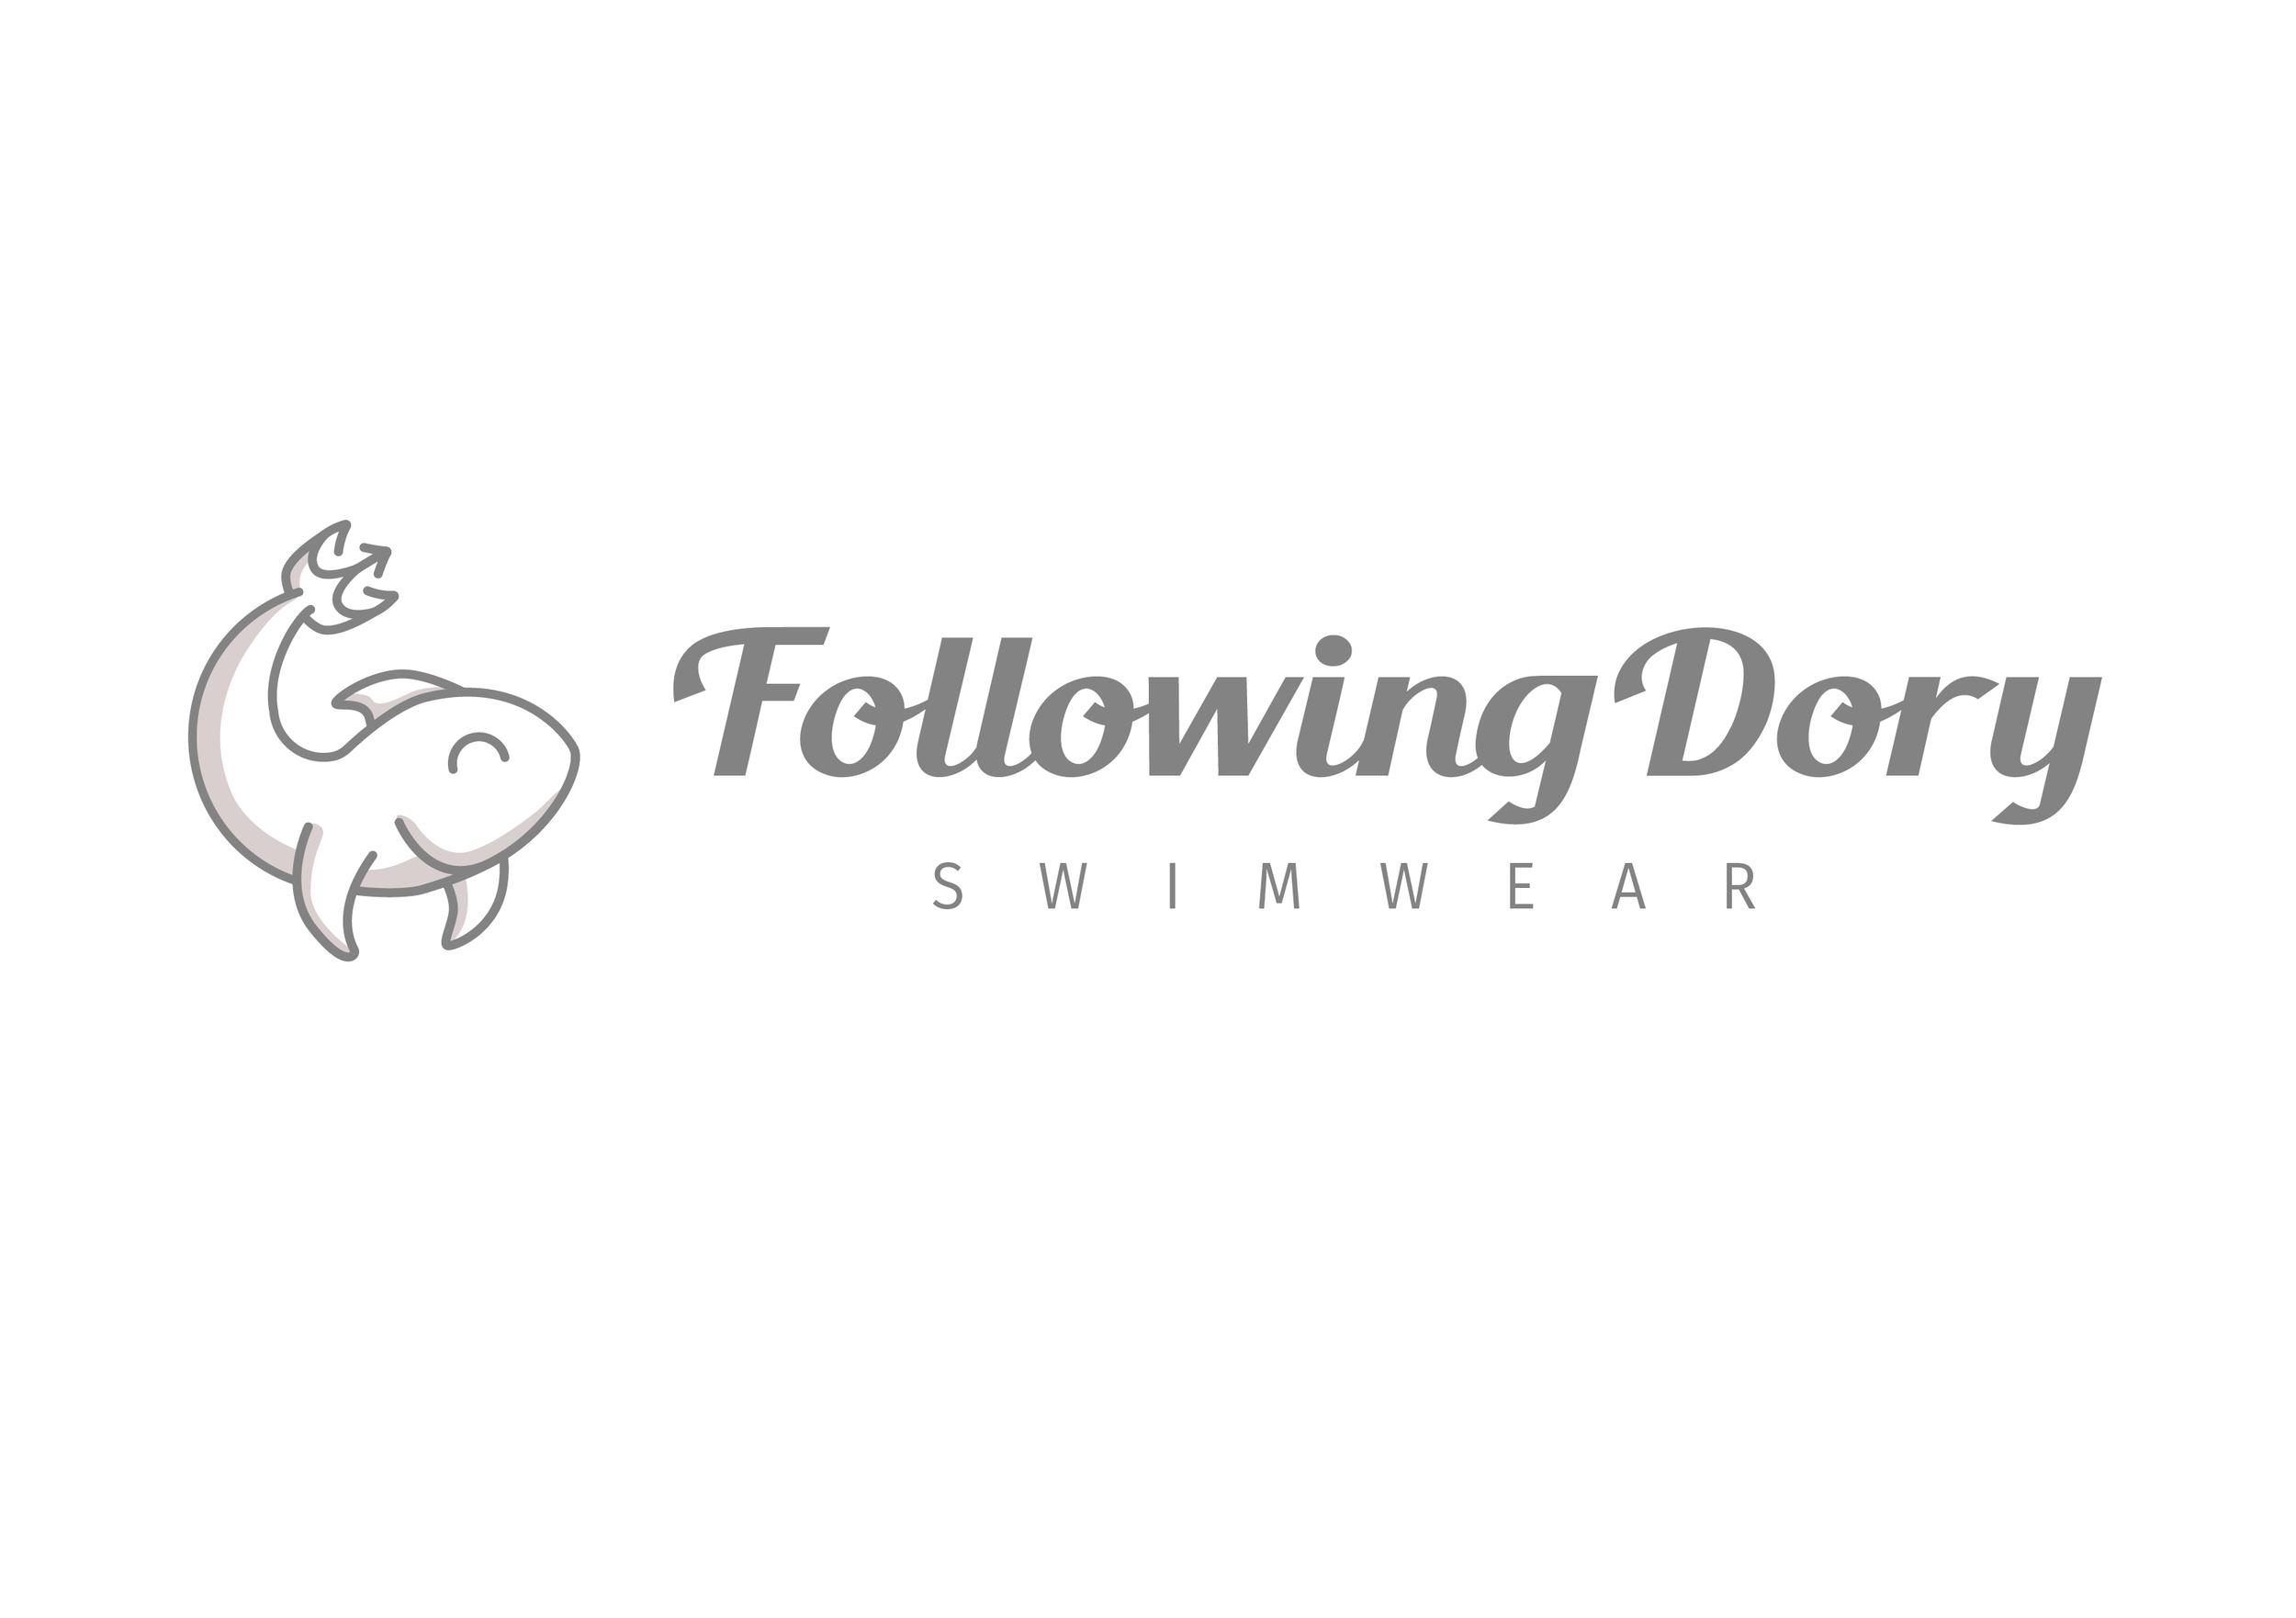 FollowingDory_Mark_FINAL-08.png